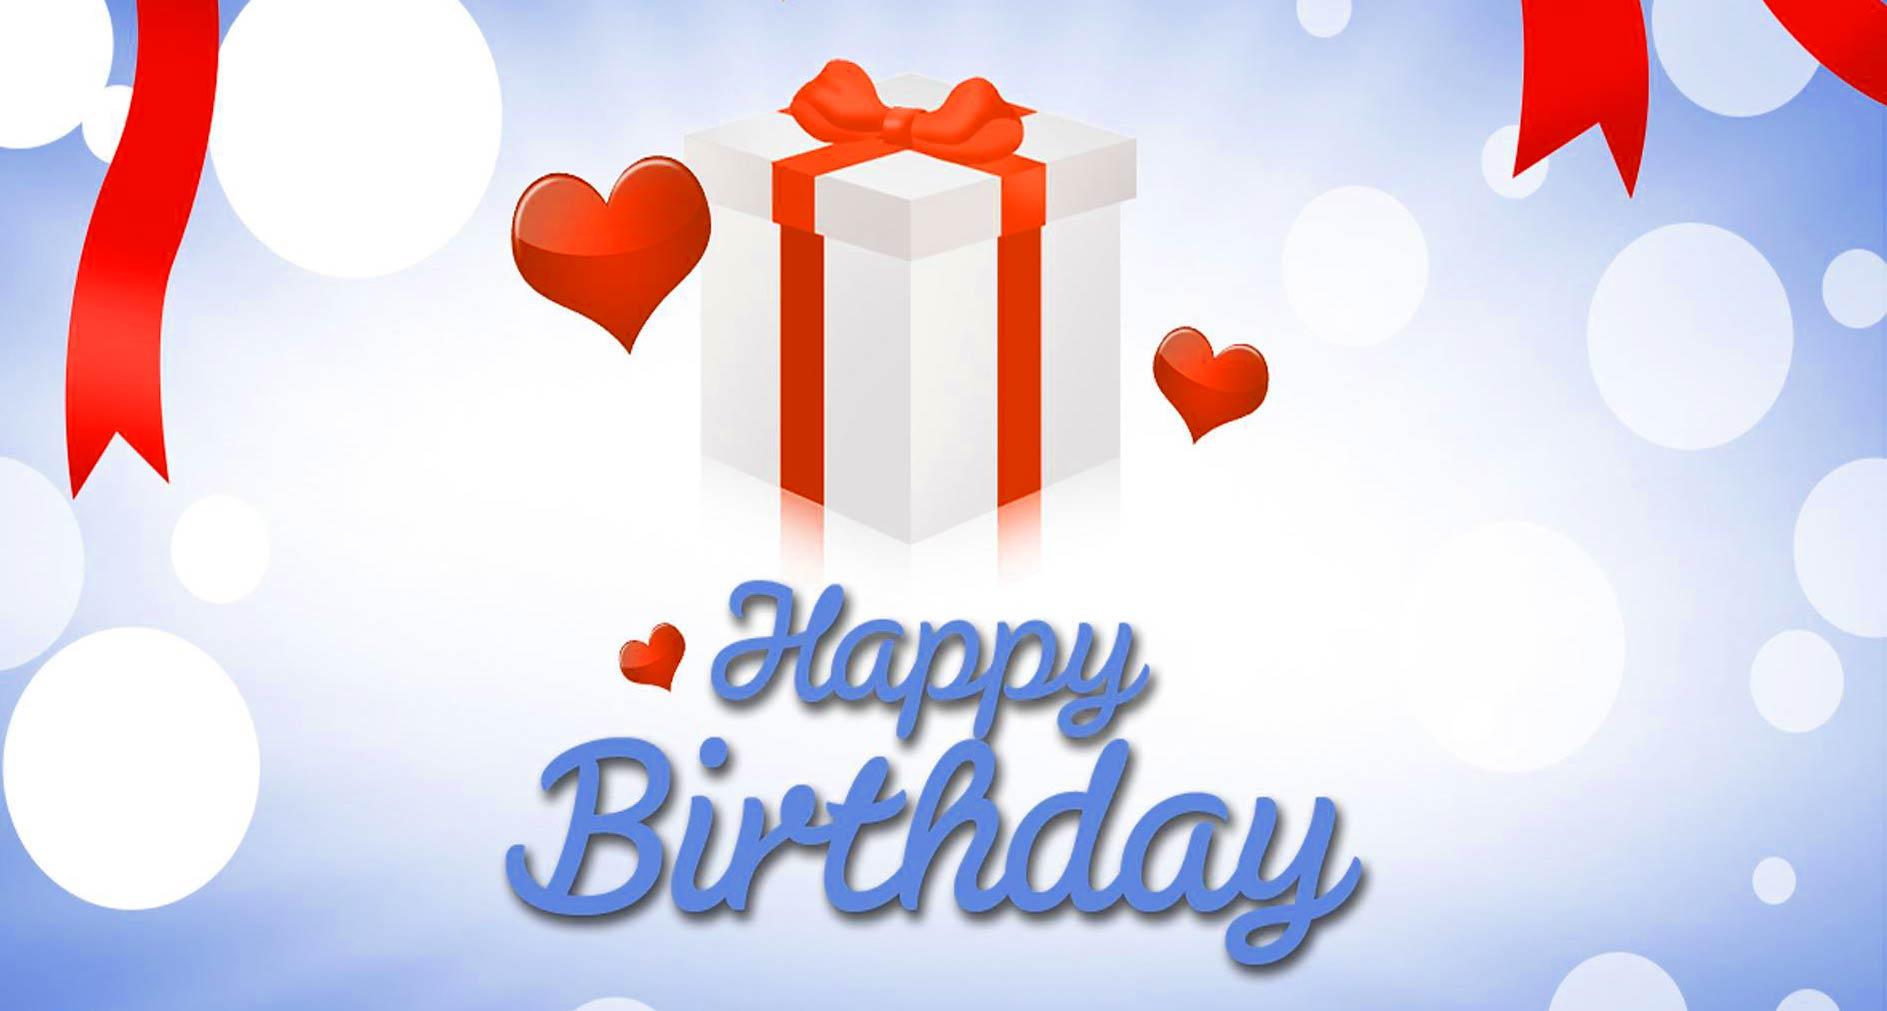 254 Happy Birthday Wishes Images Photo Pics Hd Download Good Morning Images Good Morning Photo Hd Downlaod Good Morning Pics Wallpaper Hd